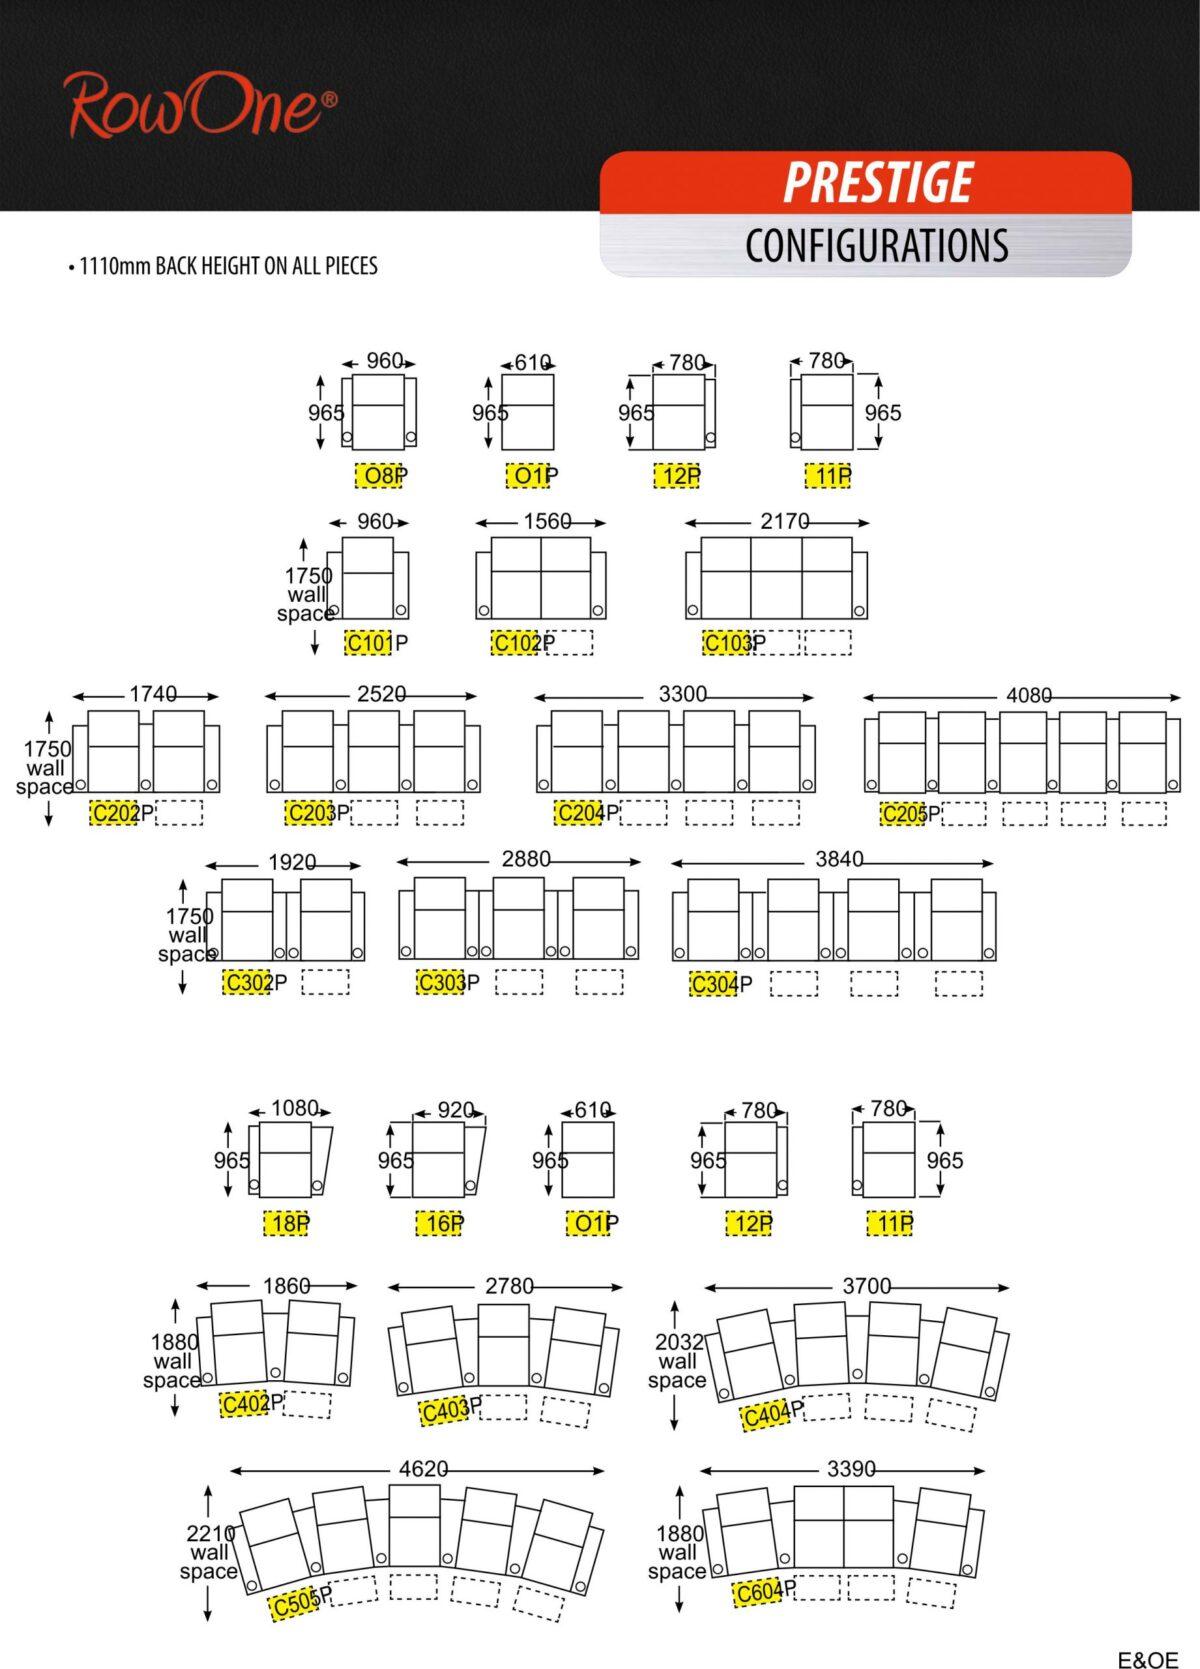 Row One Prestige Series Cinema Seats - Configurations